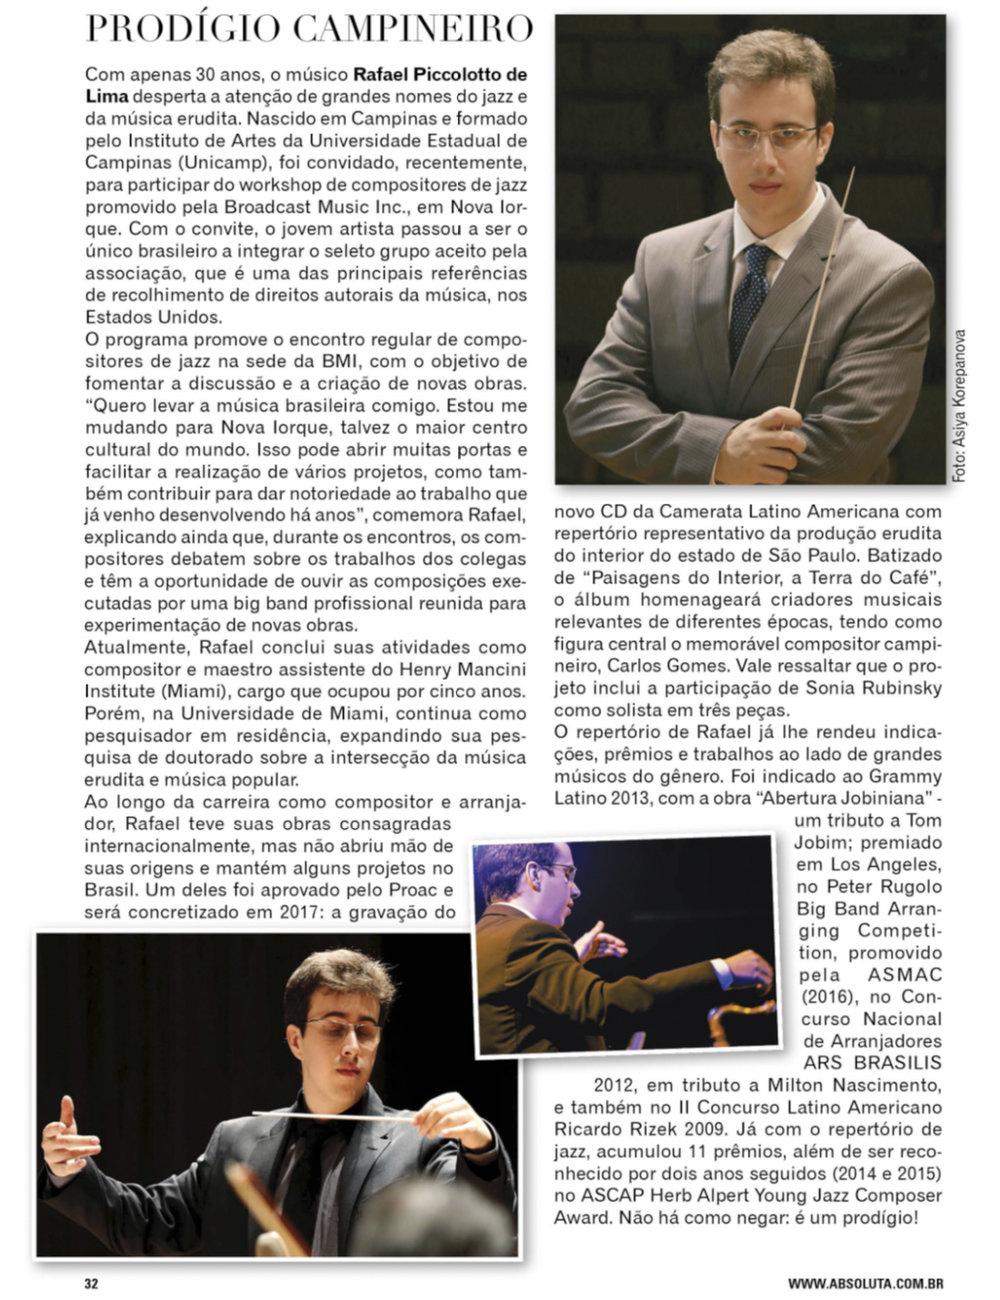 Revista Absuluta, Campinas - São Paulo, Brazil.